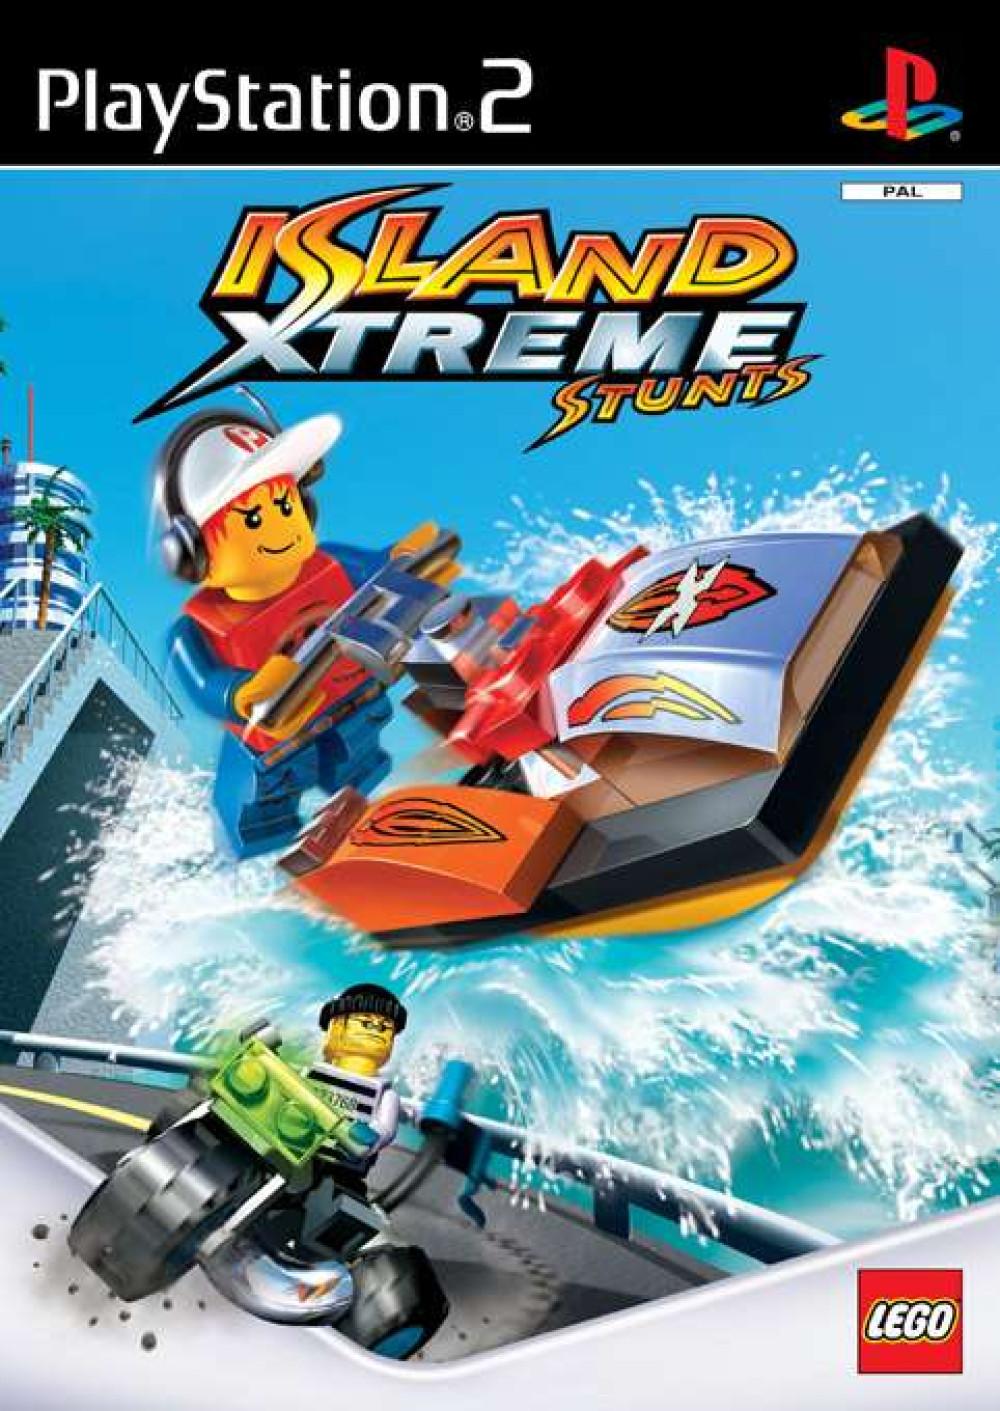 PS2 Lego Island Xtreme Stunts